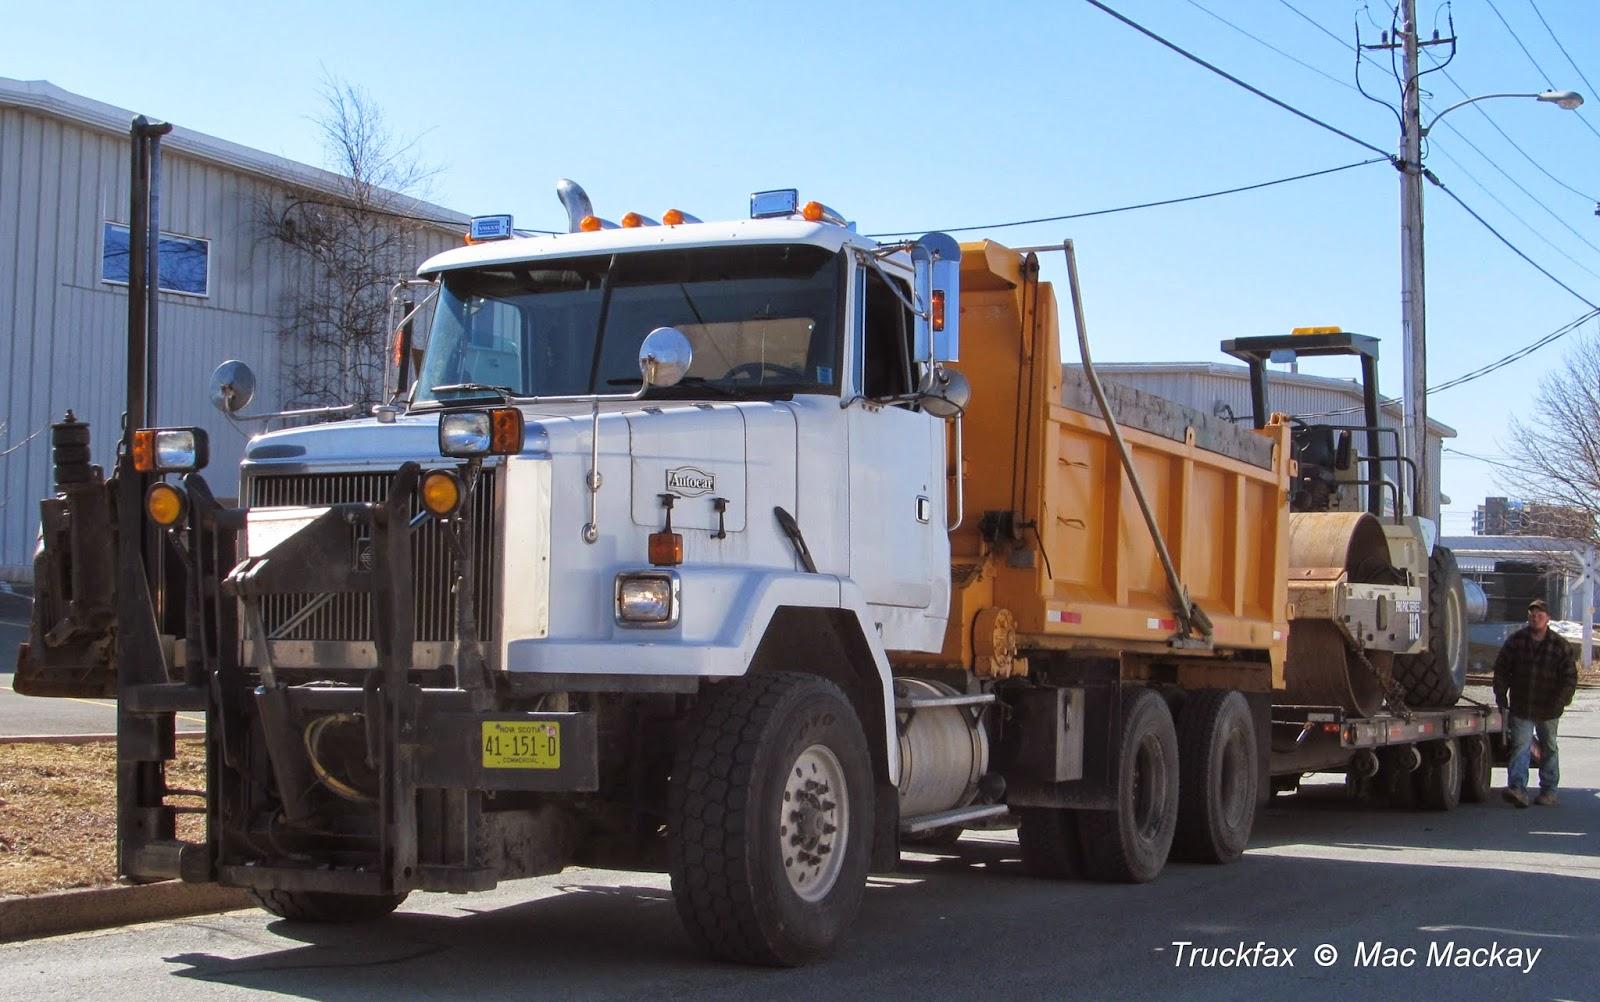 Dump Trailer Nova Scotia Rj45 Female Connector Wiring Diagram Truckfax March 2014